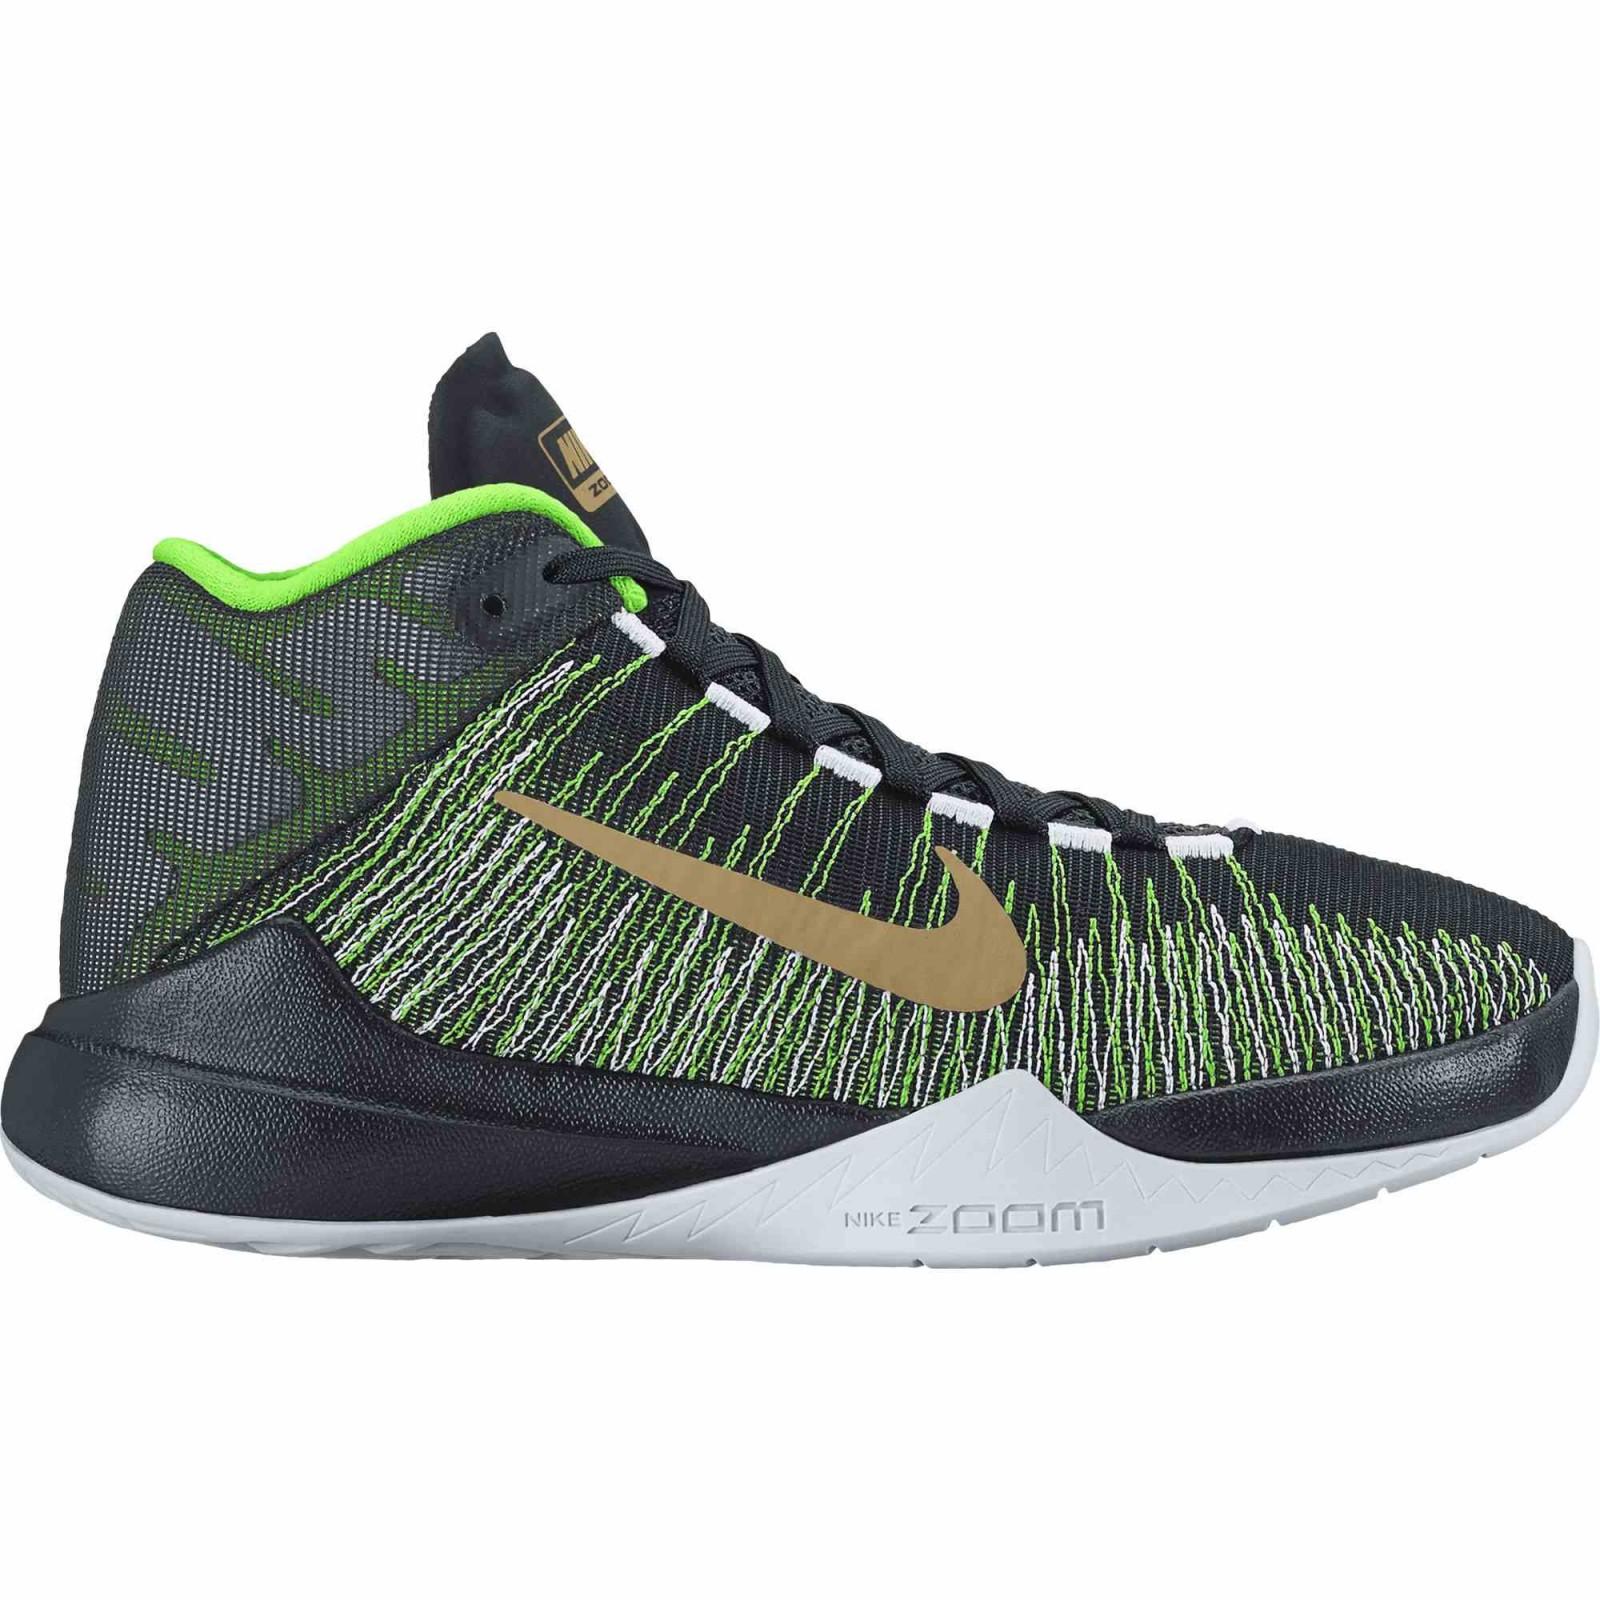 Pánské basketbalové boty Nike ZOOM ASCENTION  b12ae00b7f